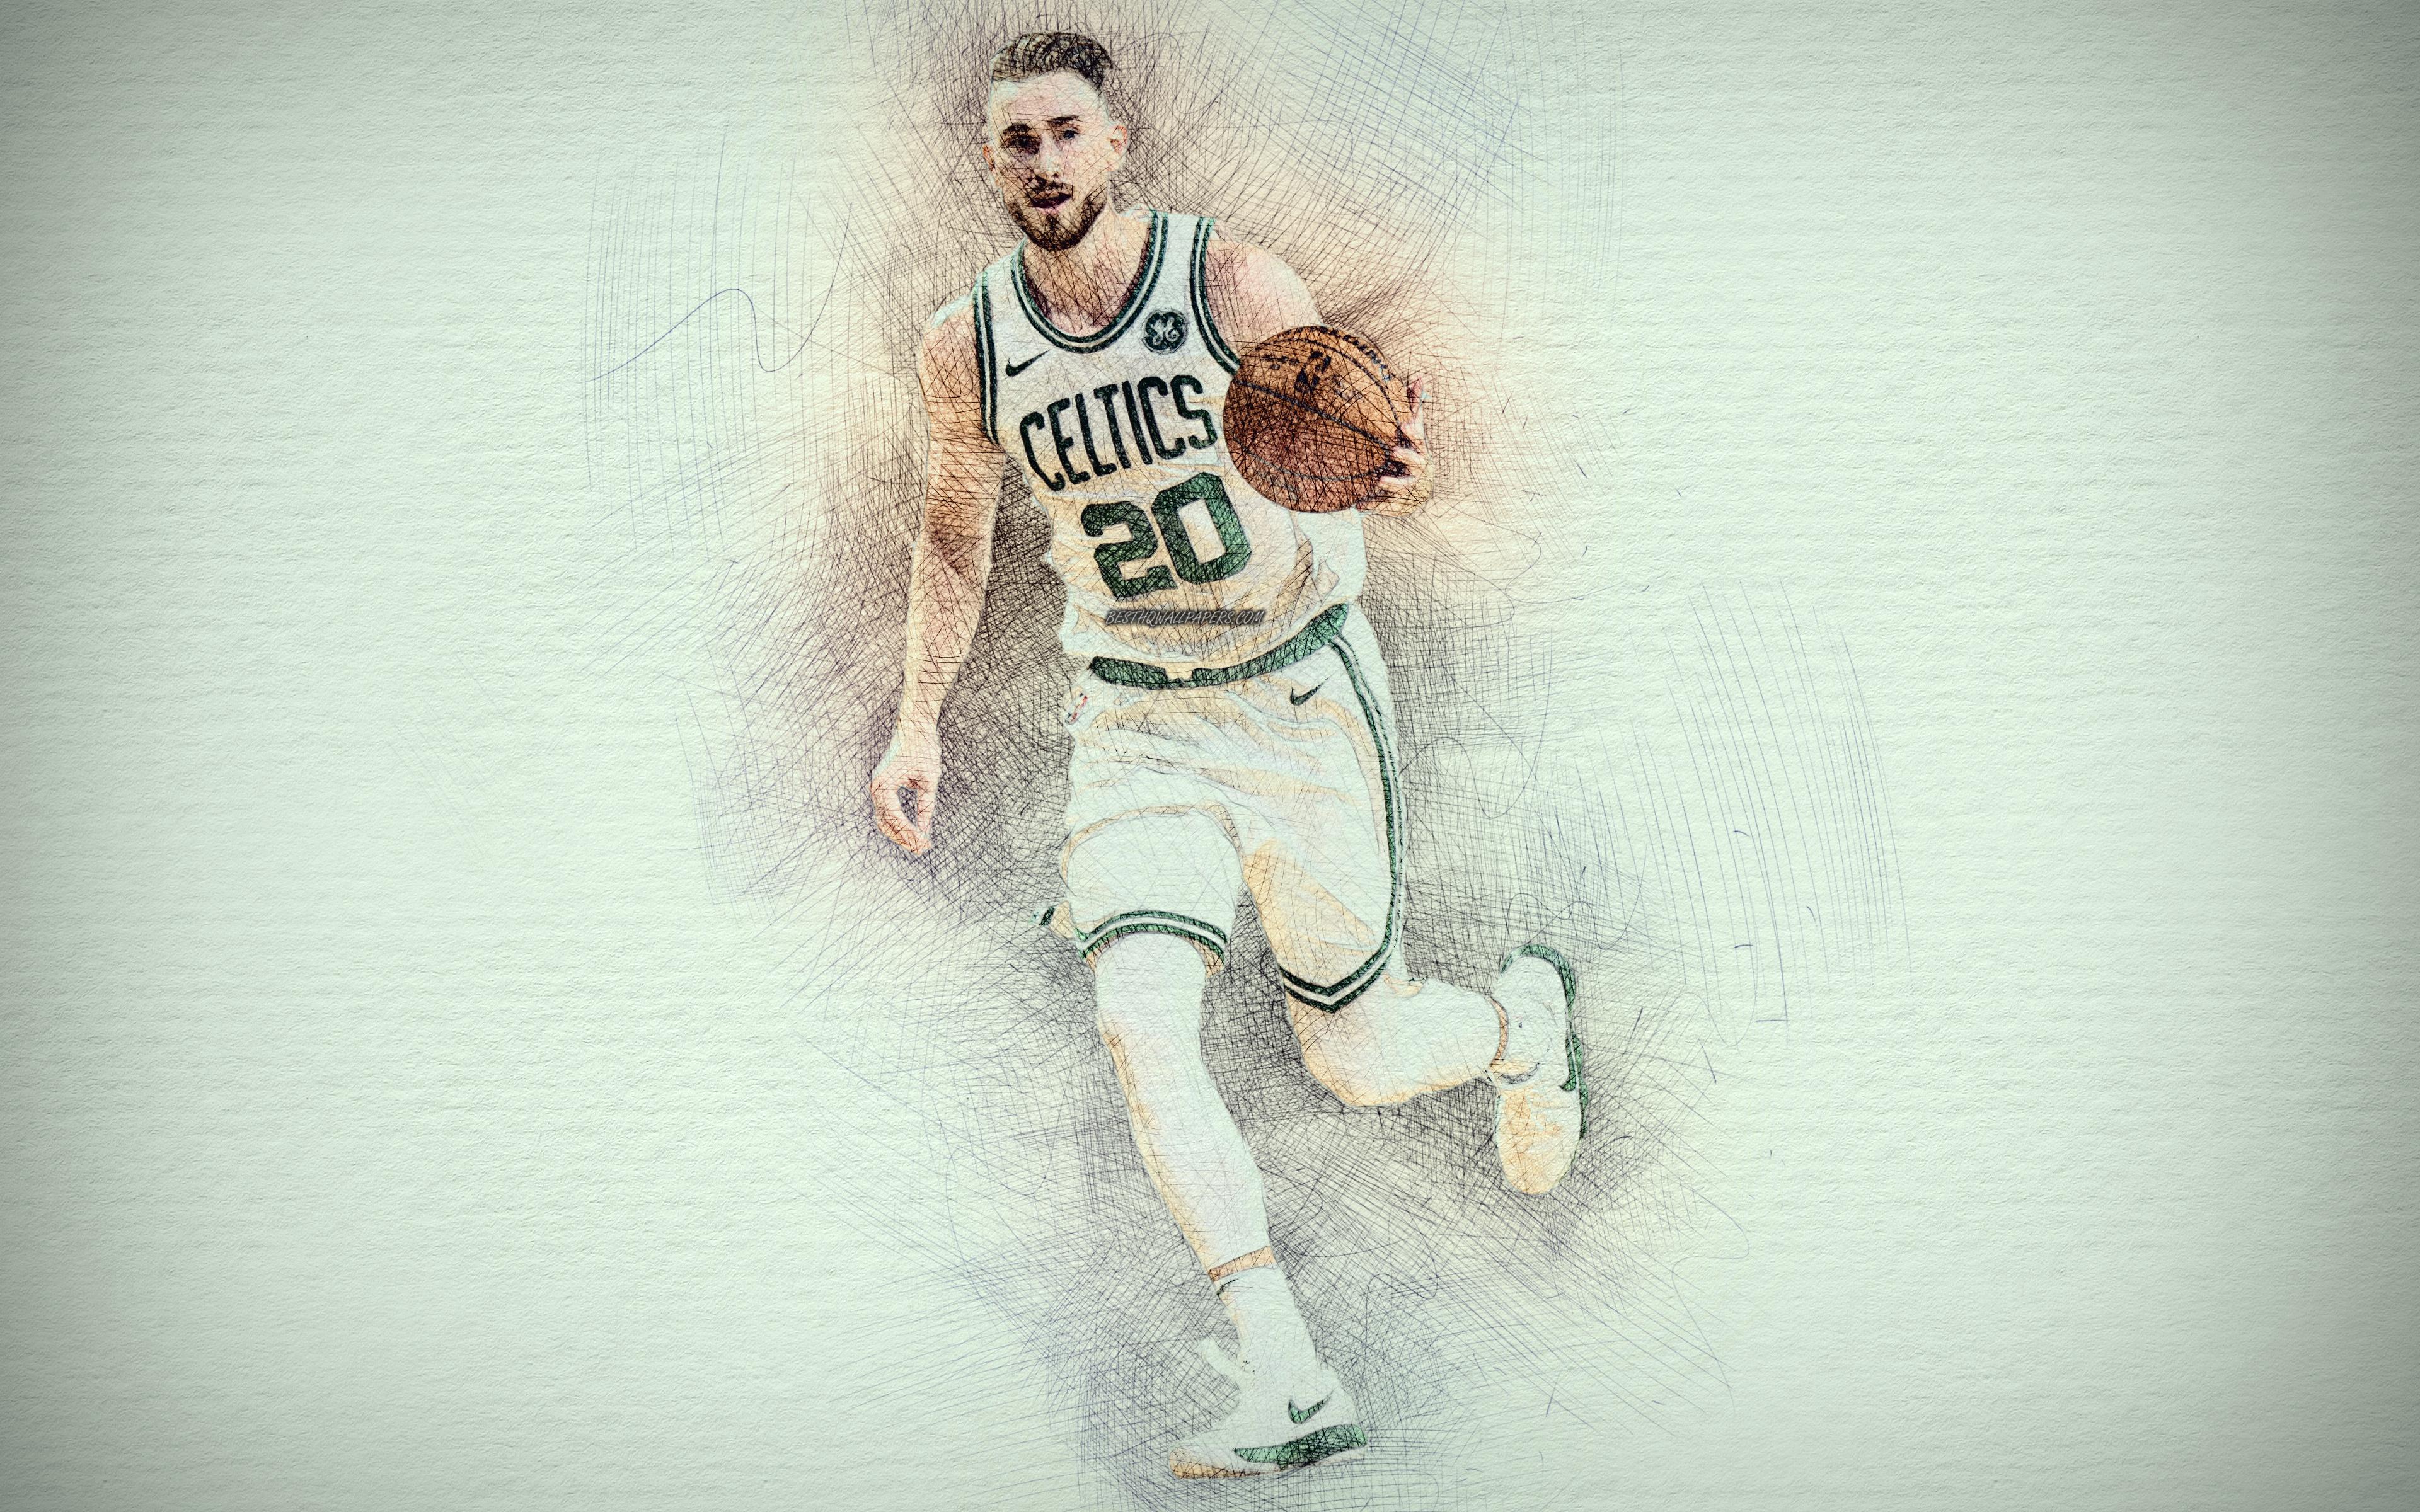 Download Wallpapers Gordon Hayward, 4k, Artwork, Basketball - Gordon Hayward Wallpaper Hd , HD Wallpaper & Backgrounds